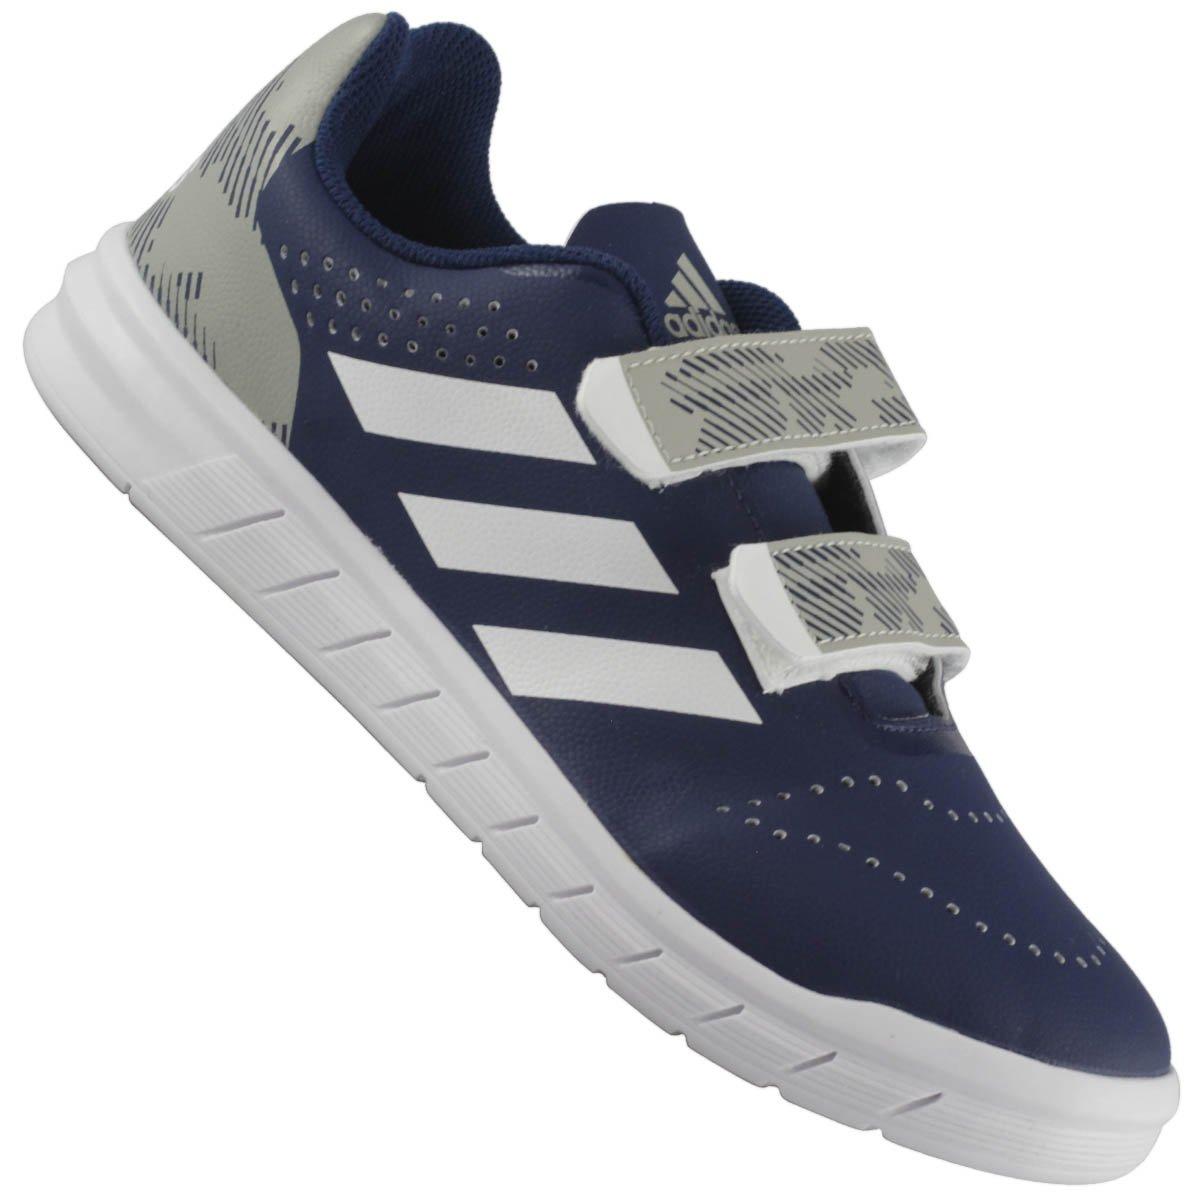 de5babfa4 Tênis Adidas Quicksport CF C Infantil